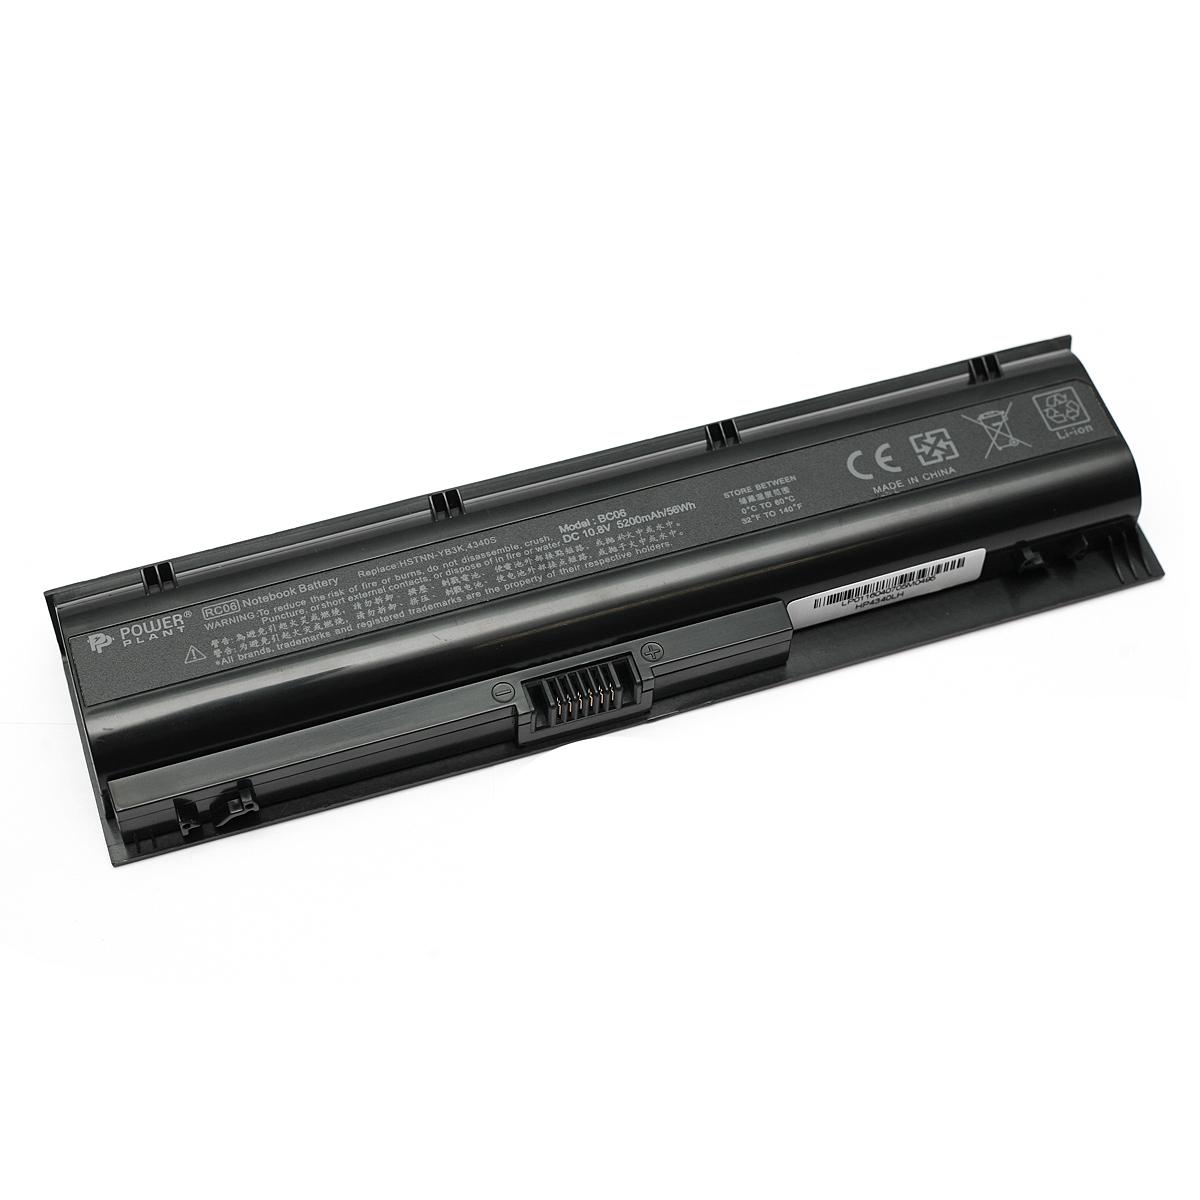 Купить Аккумулятор PowerPlant для ноутбуков HP ProBook 4340s (HSTNN-YB3K, HP4340LH) 10.8V 5200mAh